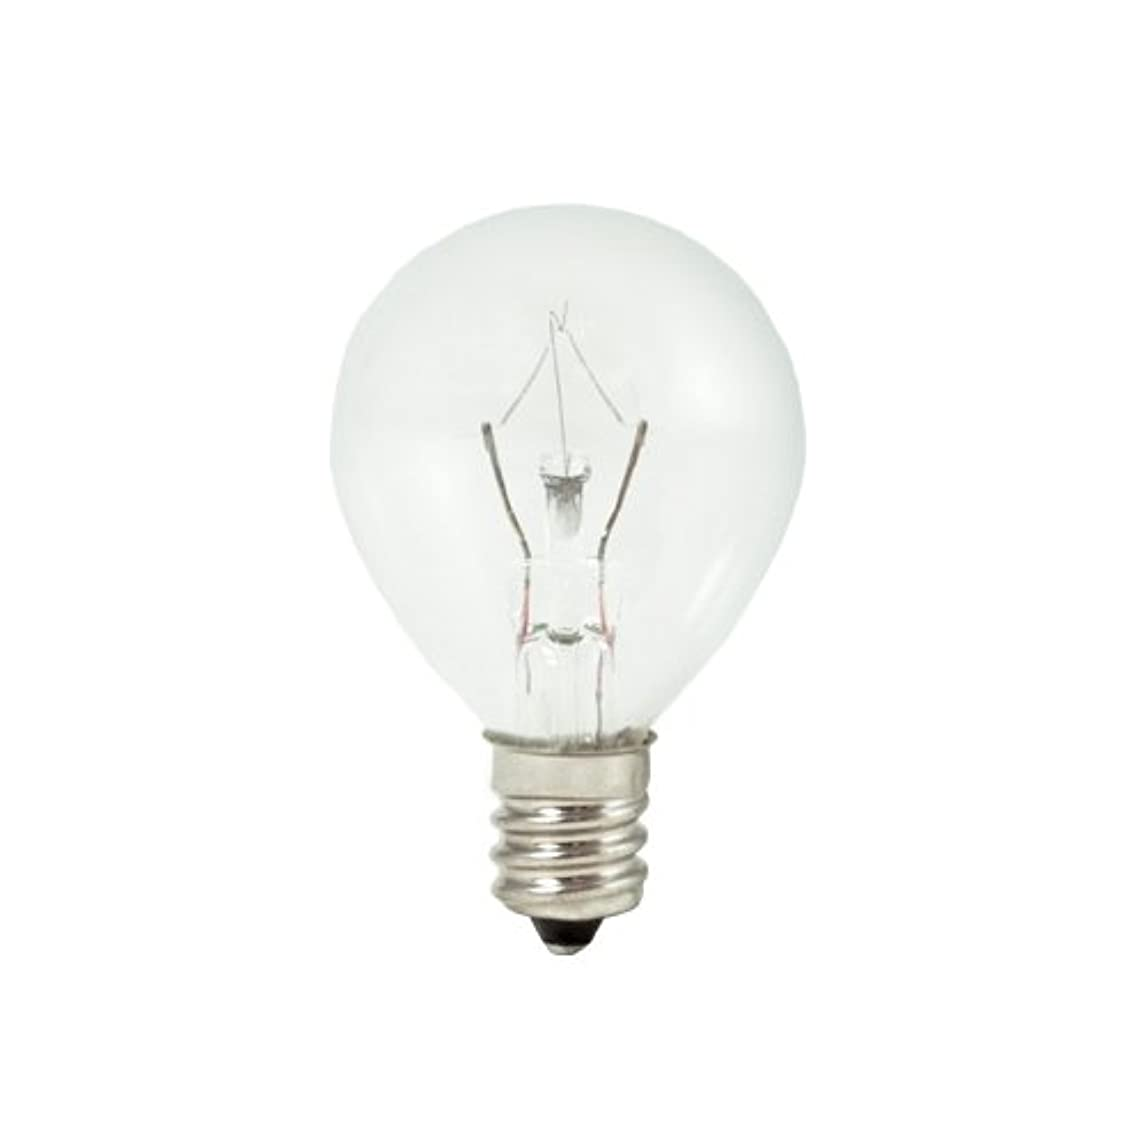 Bulbrite KR25G11CL-10PK 25W Krystal Touch G11 Globe Chandelier Bulb, Candelabra Base, 10-Pack wyatbsbswdypvj